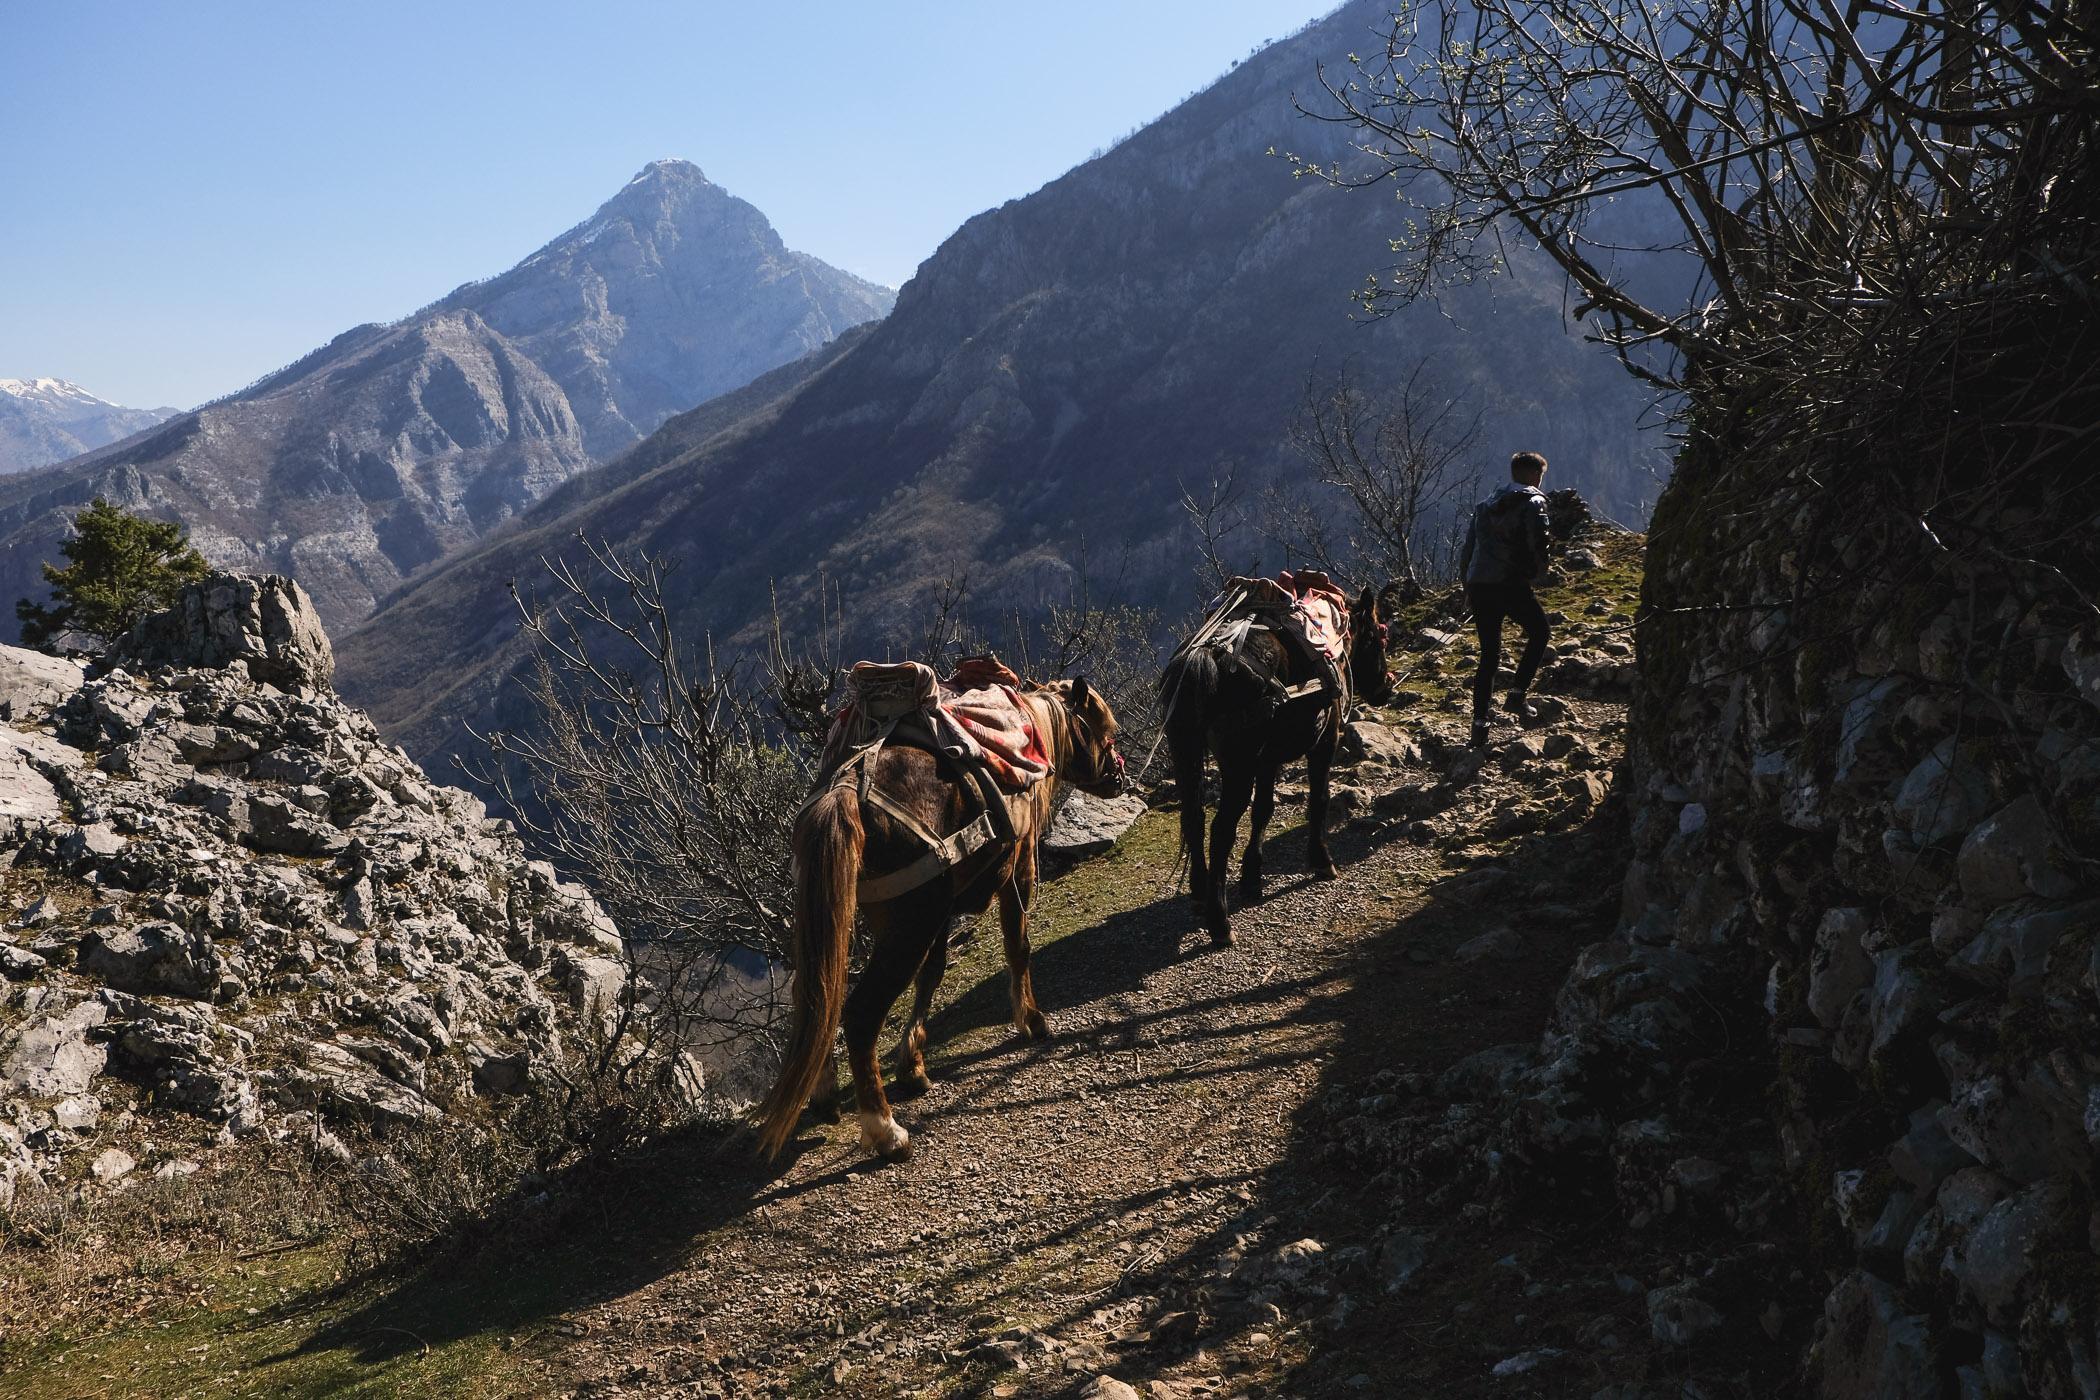 Fonsi Bikaj walks with two horses near his family's house in Kalsa, the hamlet where they spend the winter months, Kelmend region, Albania.